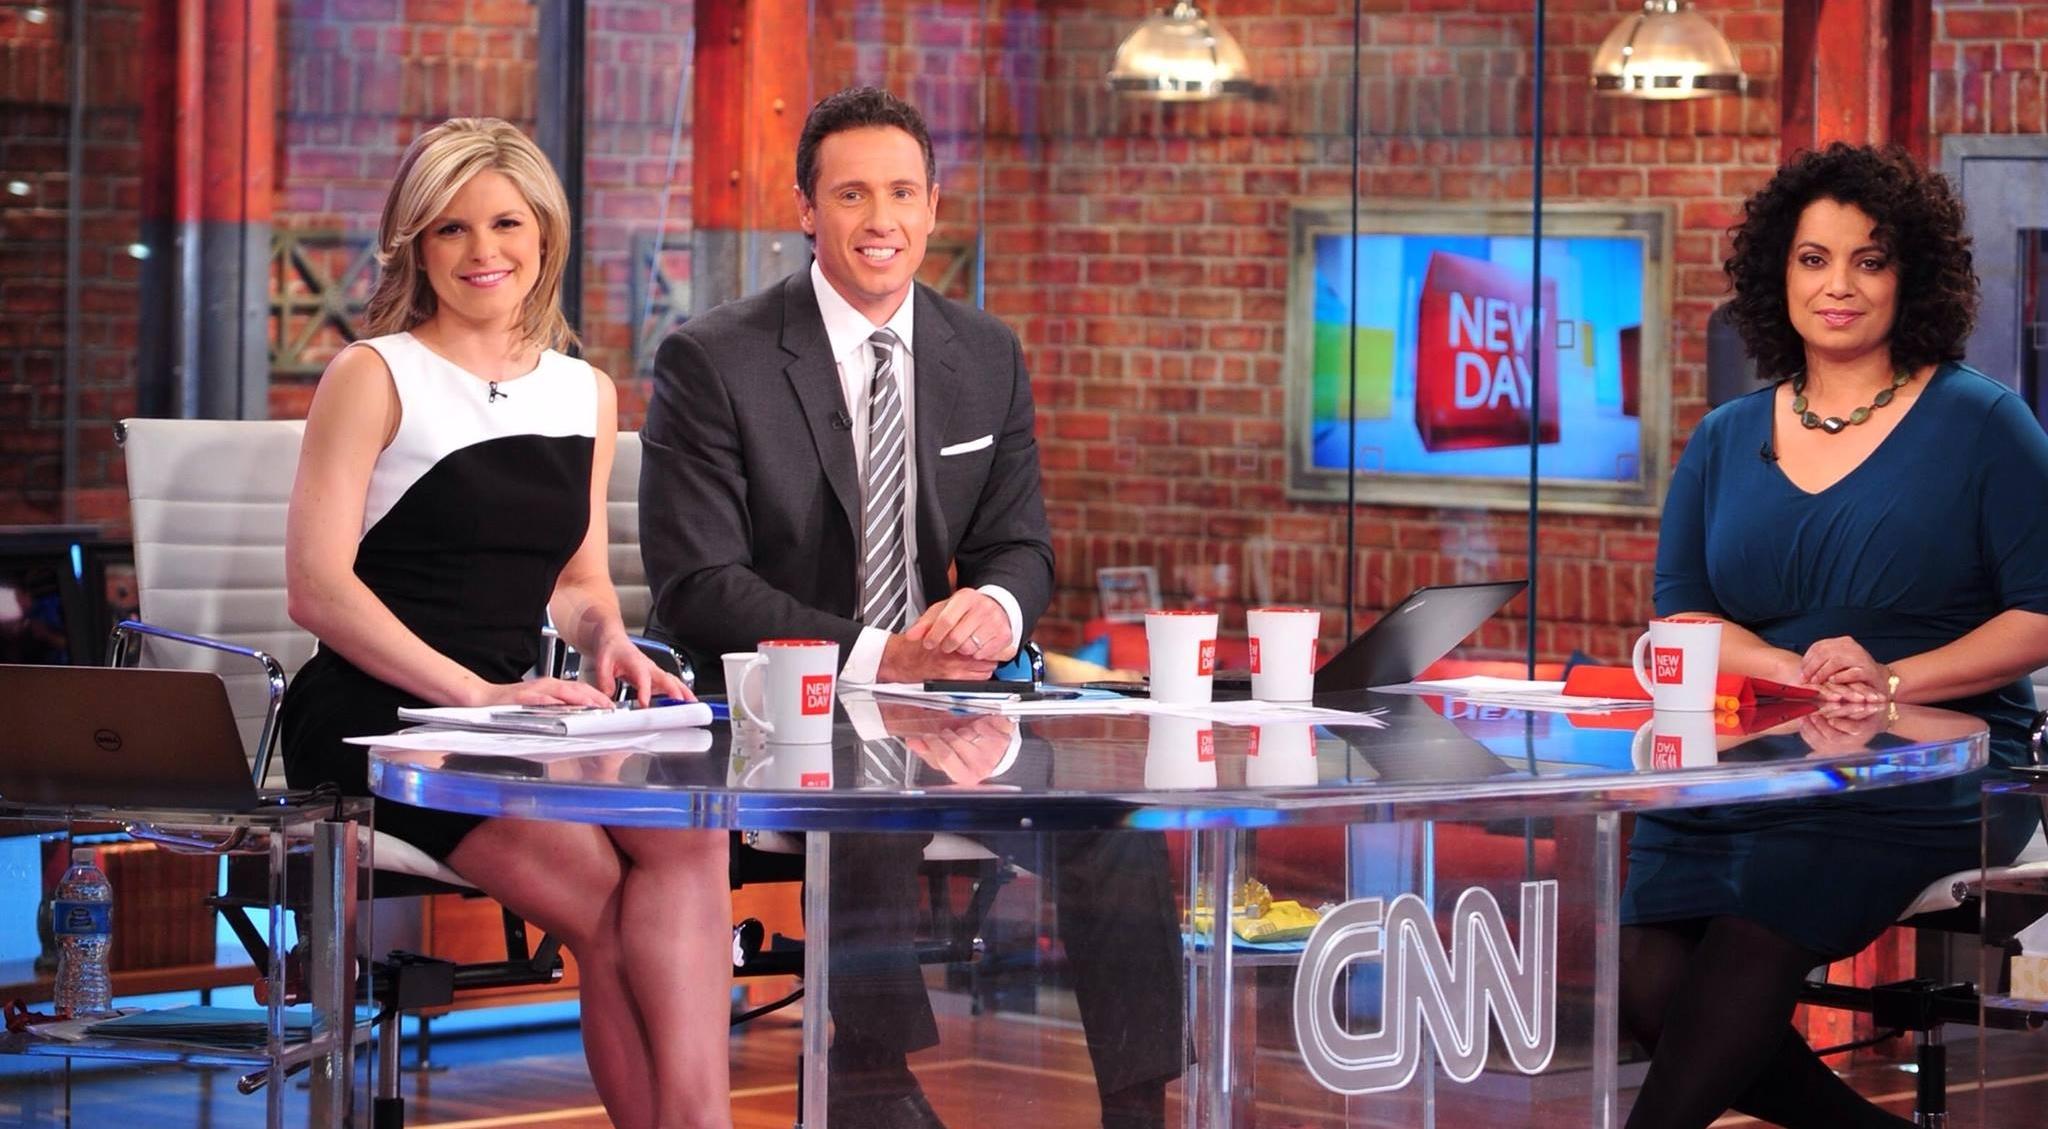 Kate Bolduan, Michaela Pereira and Chris Cuomo on a talk show 'New Day'